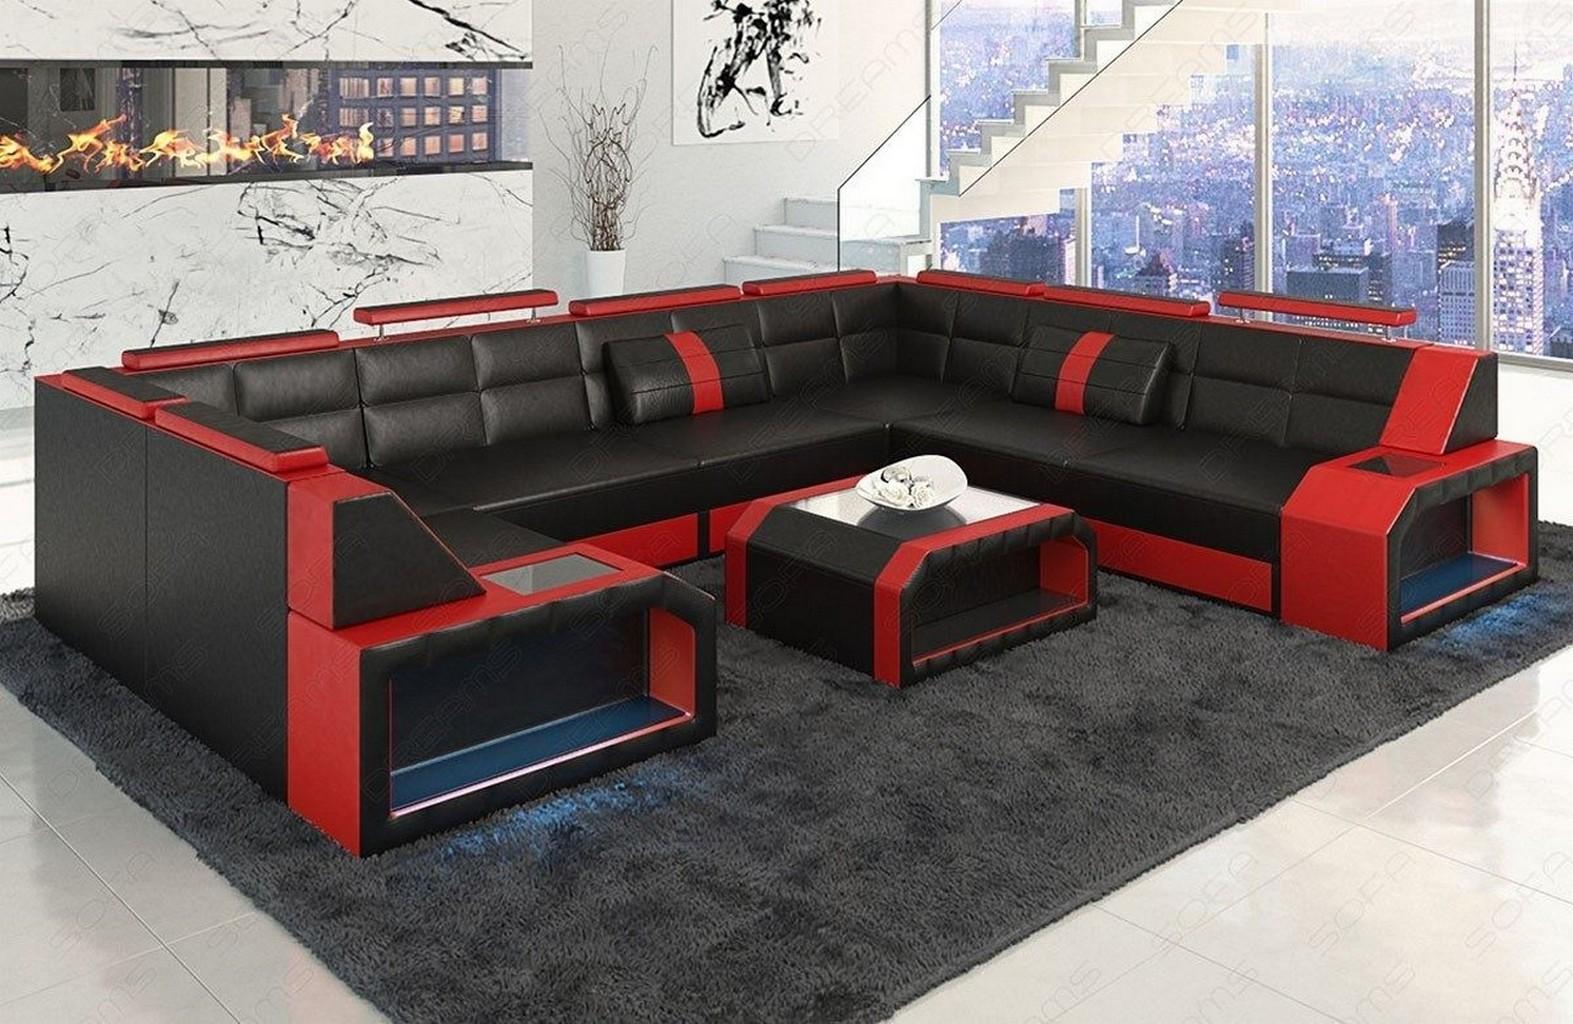 Ledersofa eckcouch sofa garnitur pesaro xl u form led for Wohnlandschaft rot schwarz